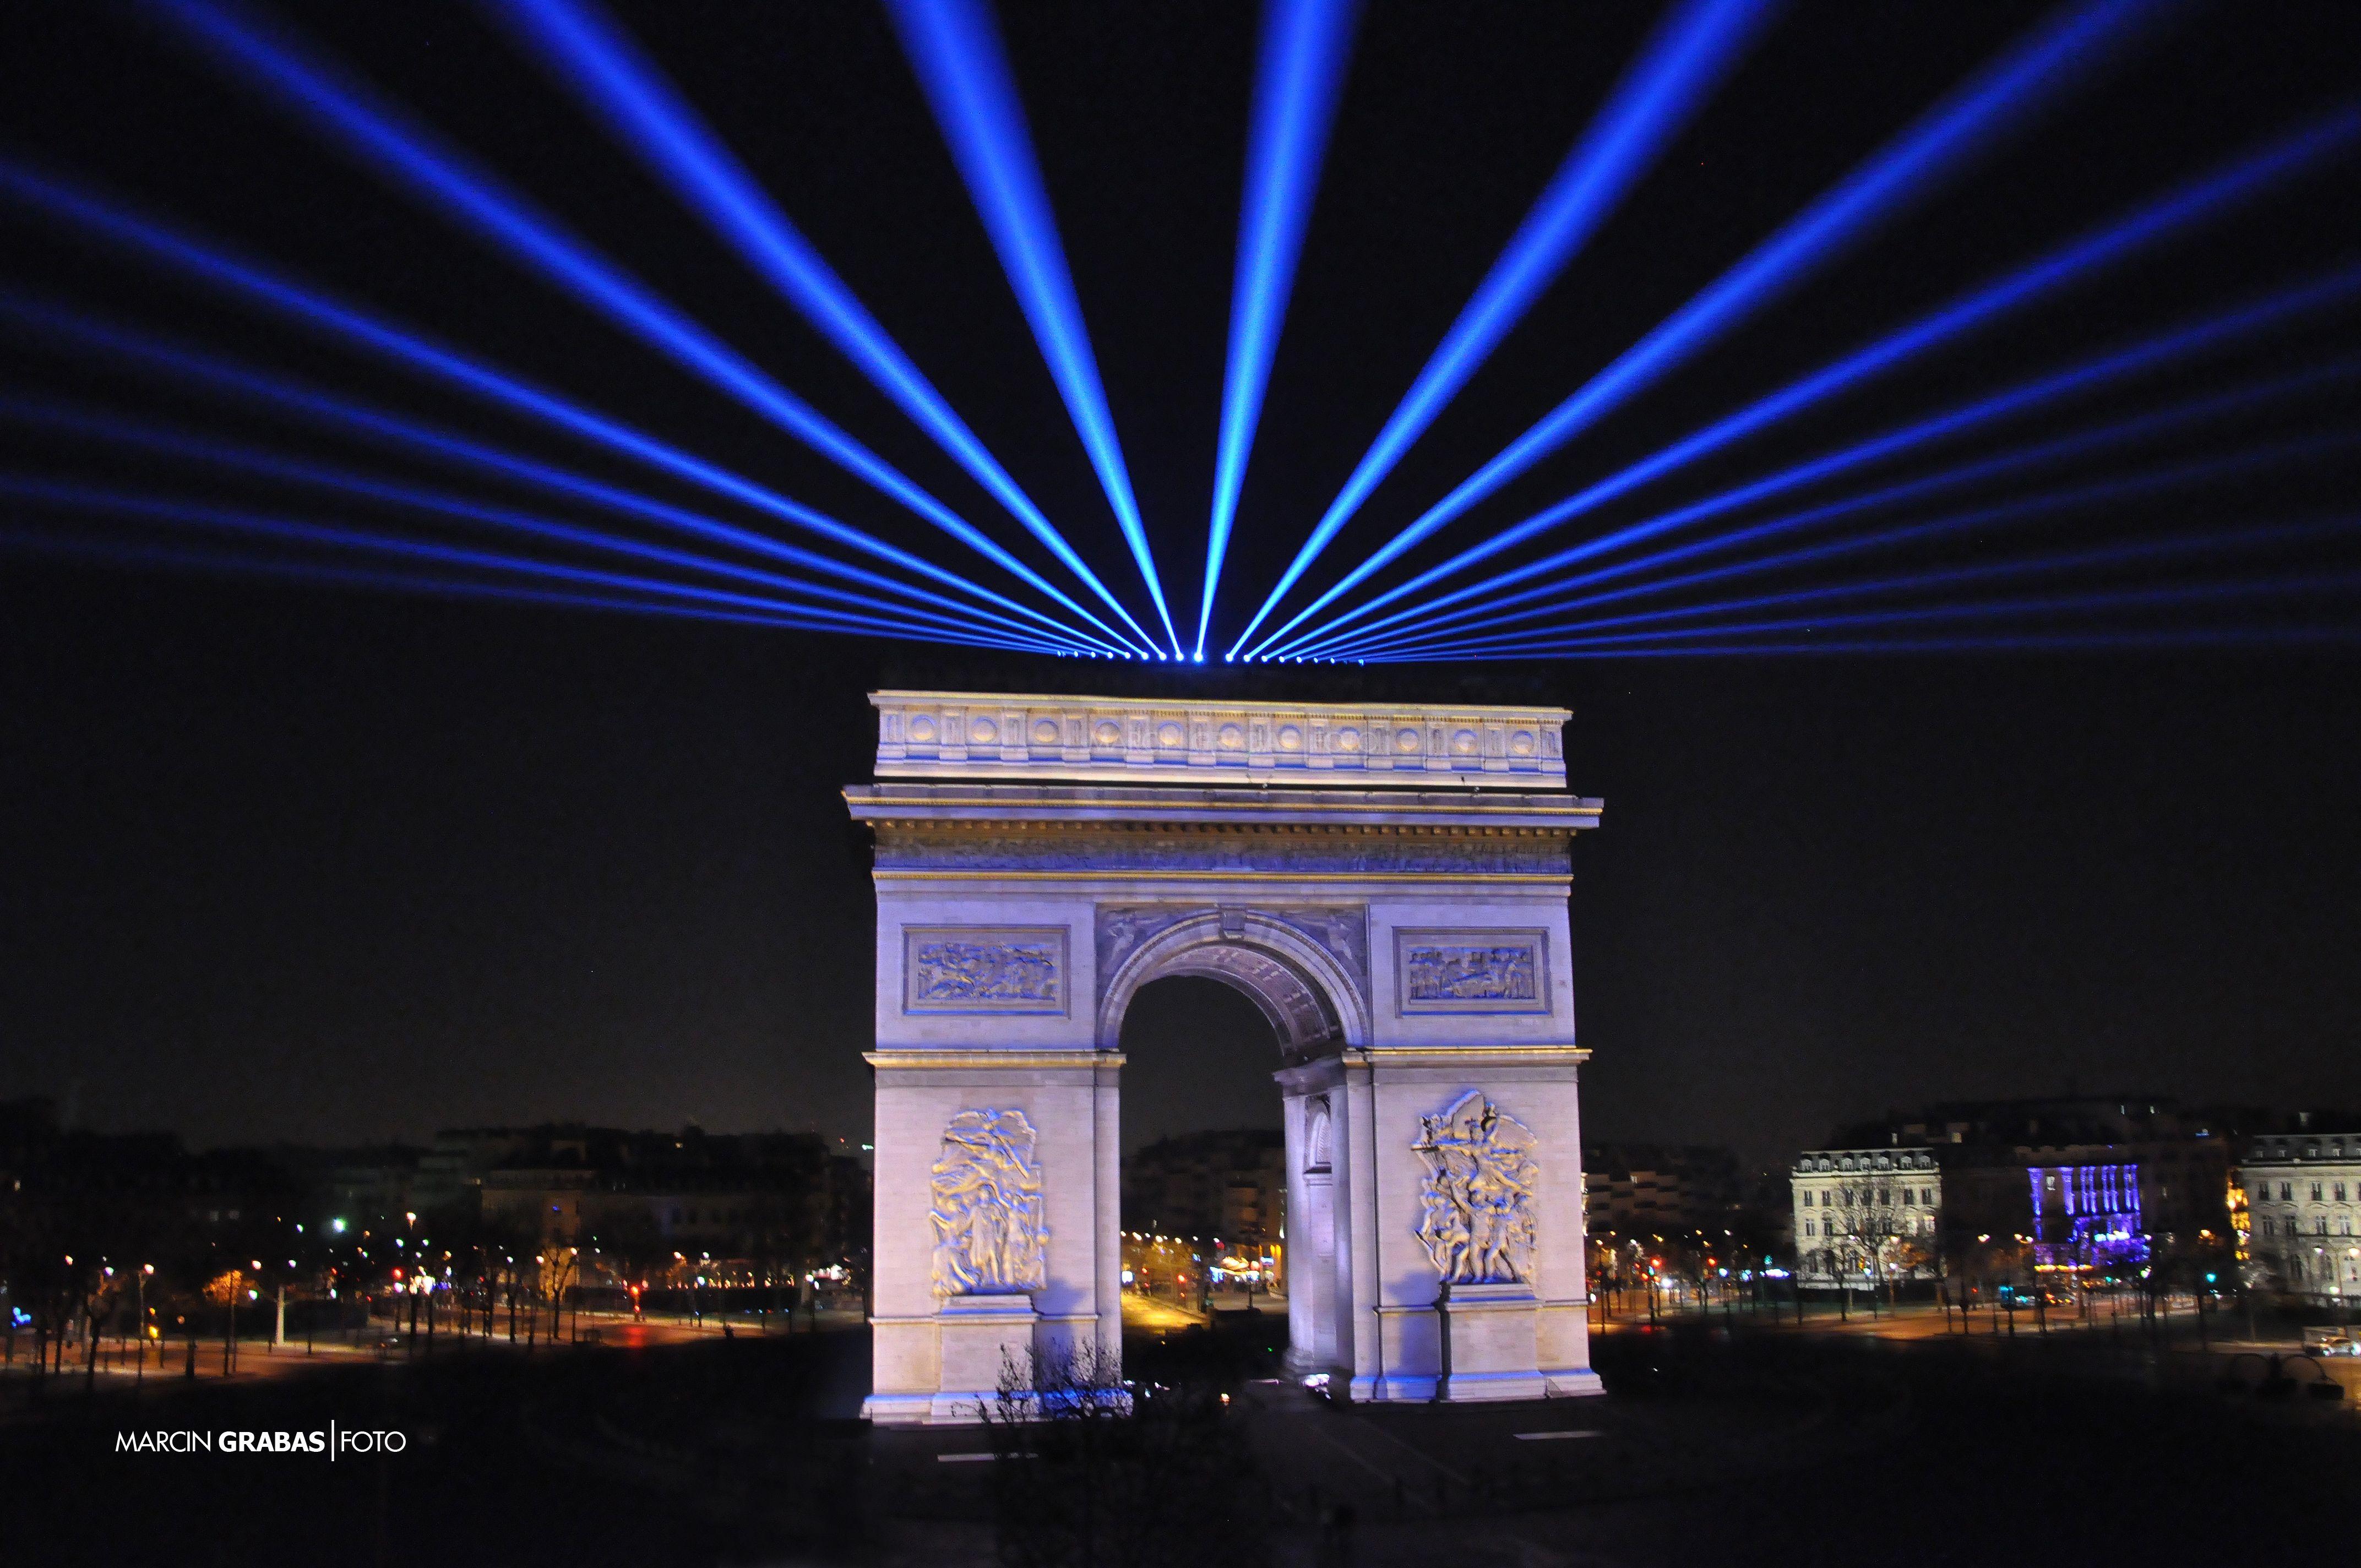 Nowy Rok – Sylwester Paryż 2015